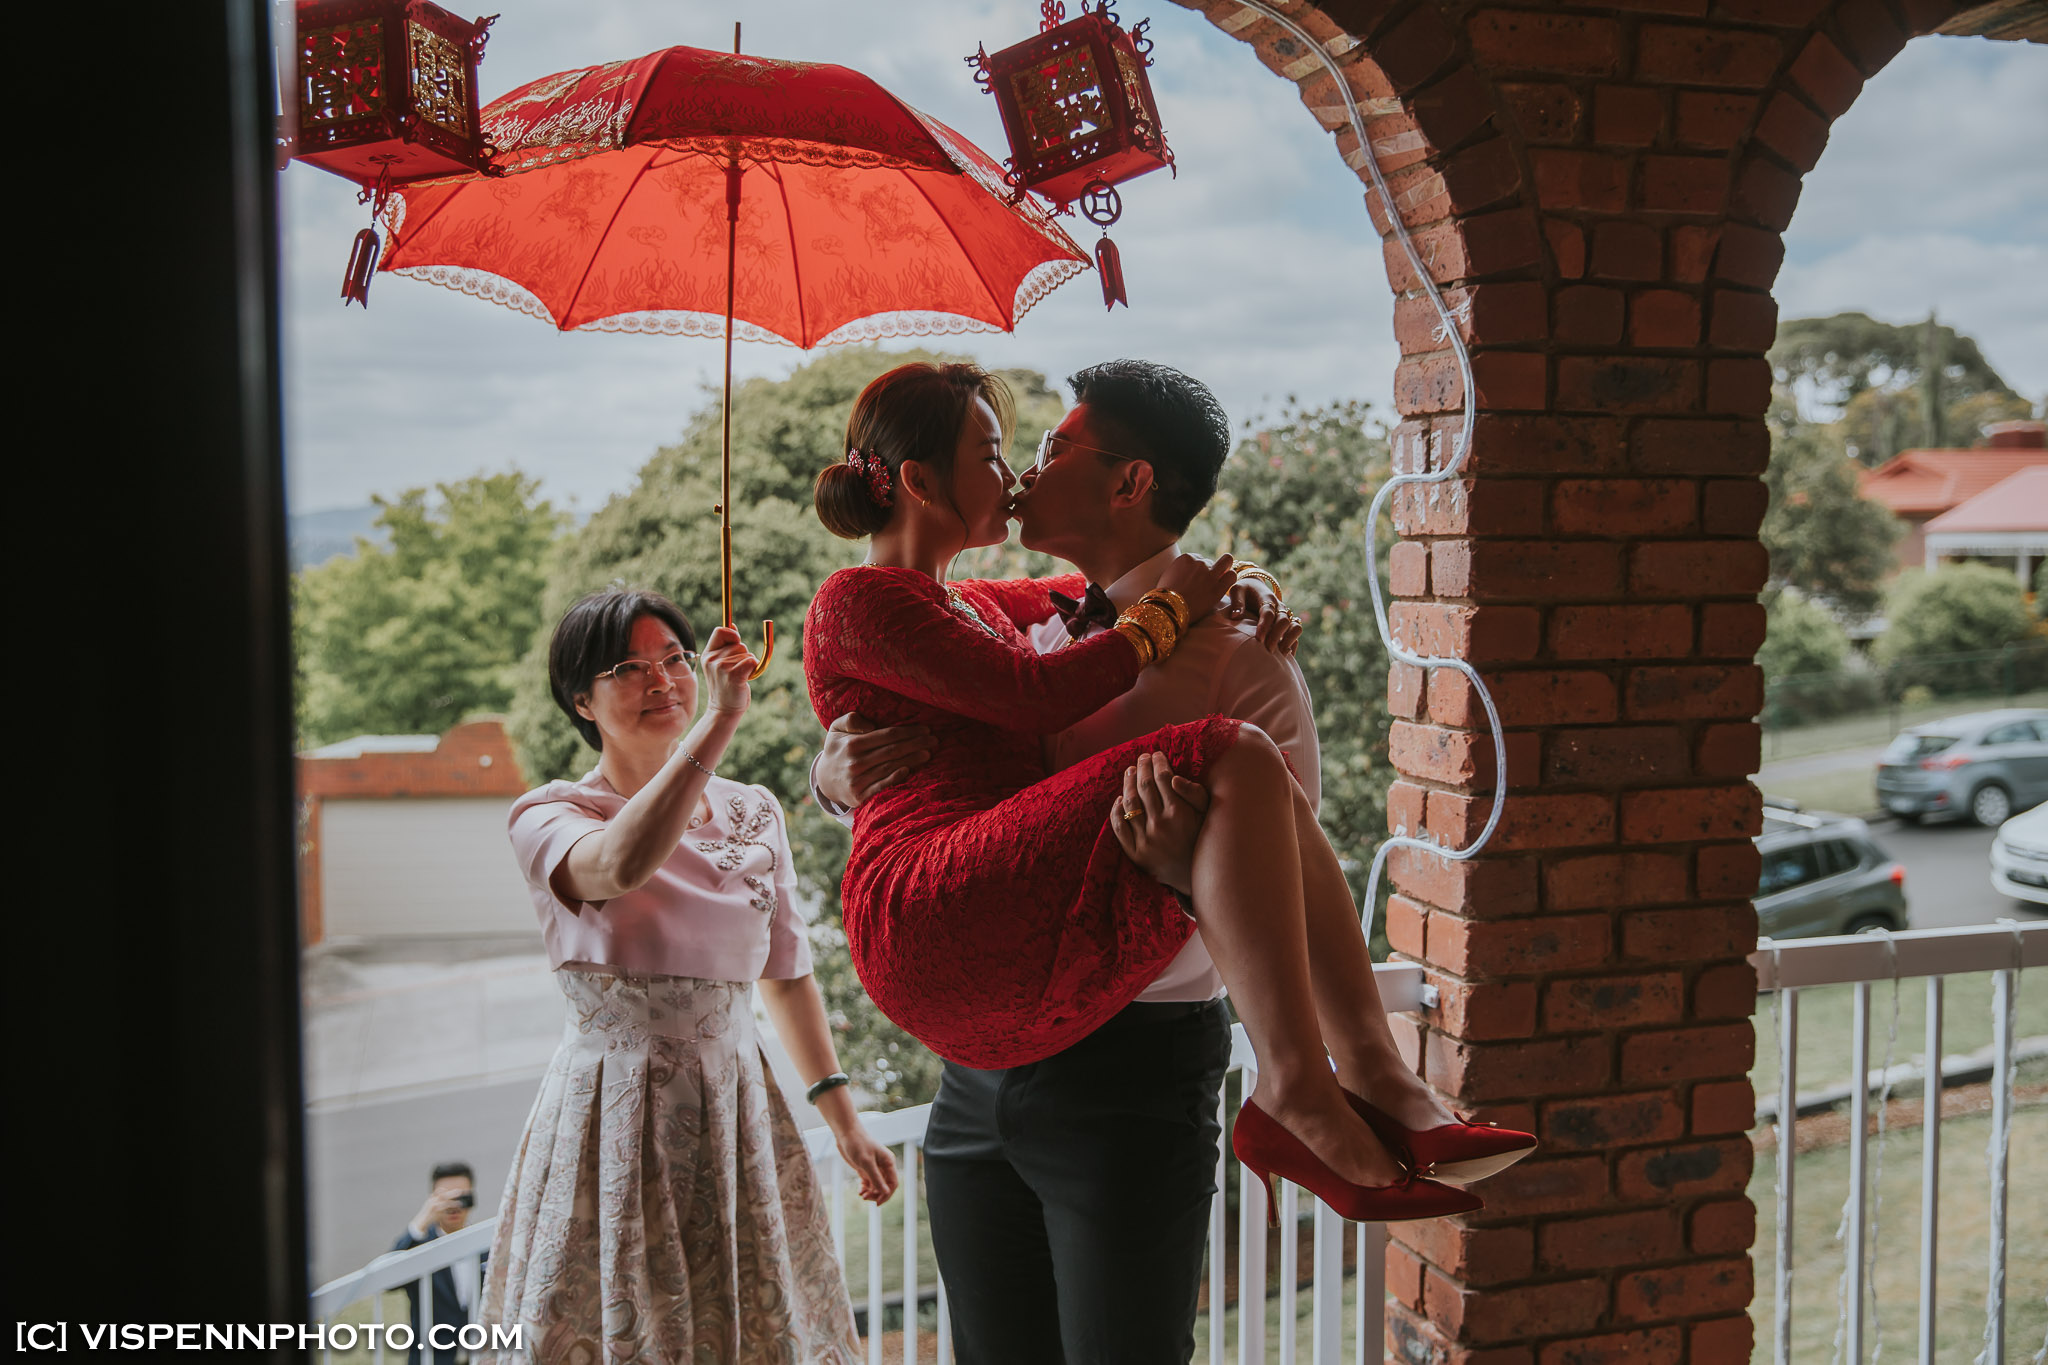 WEDDING DAY Photography Melbourne VISPENN 墨尔本 婚礼跟拍 婚礼摄像 婚礼摄影 结婚照 登记照 ElitaPB 02836 2P 1DX2 VISPENN